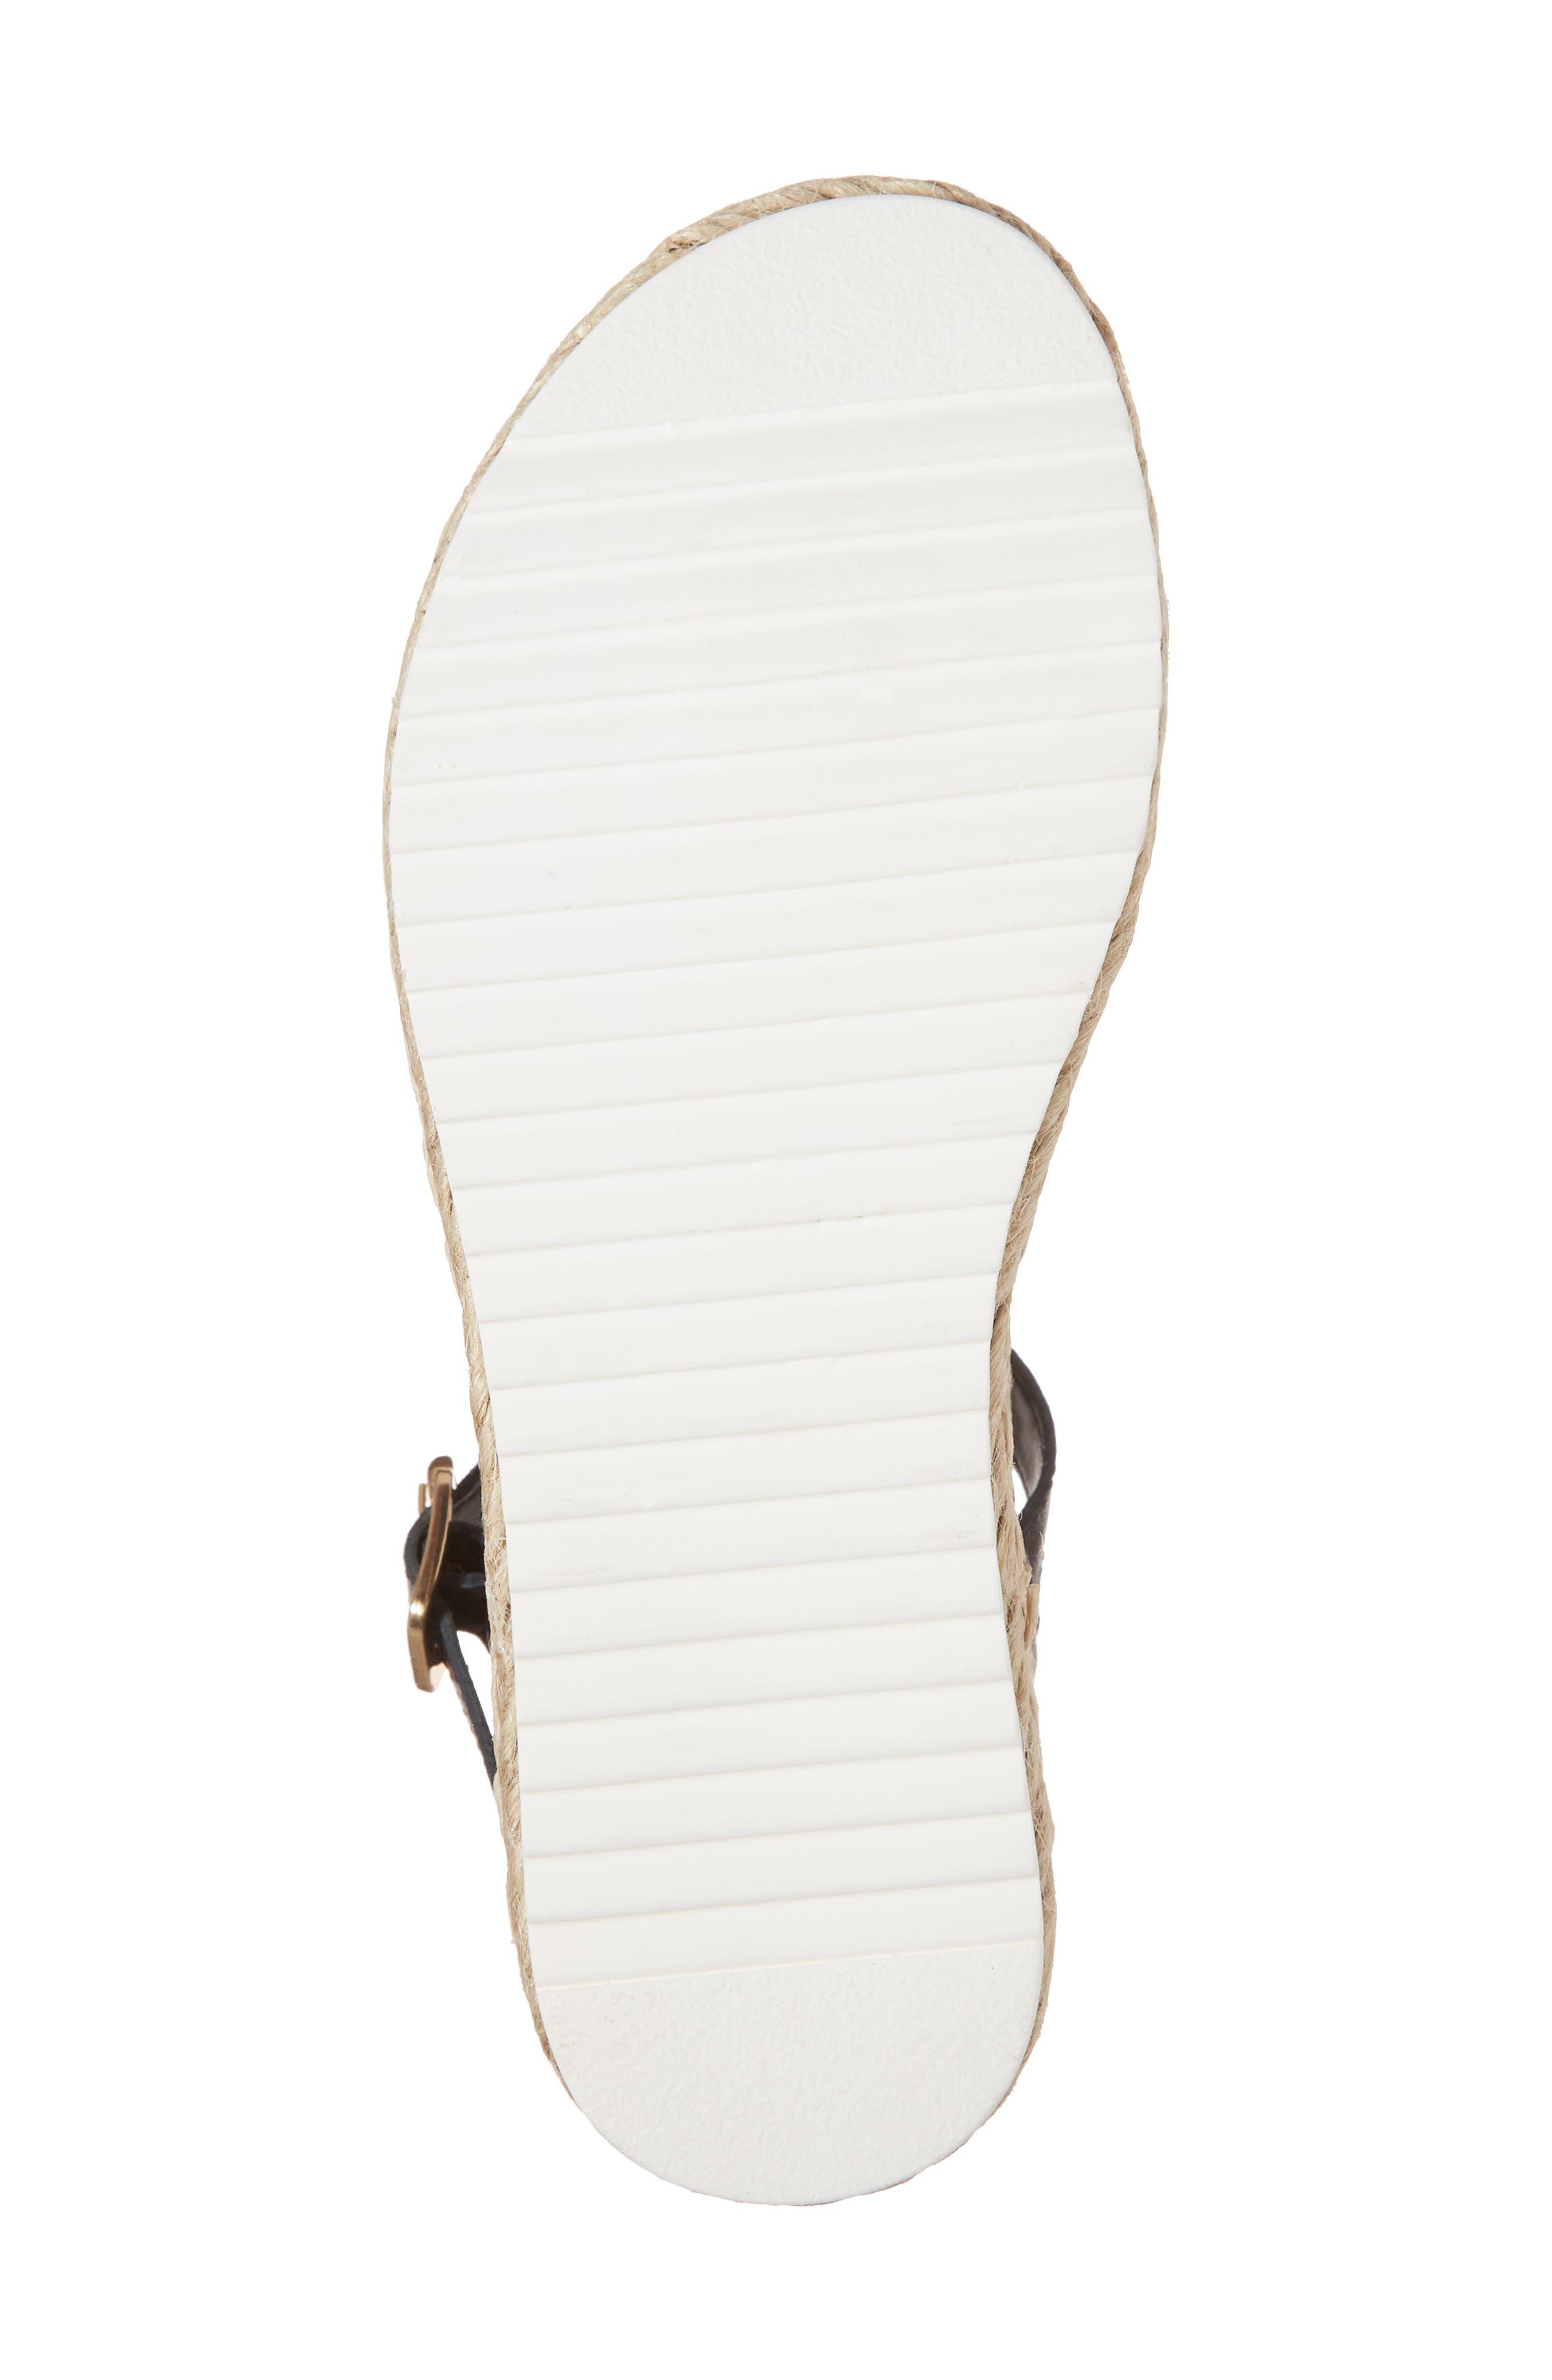 Chiara Platform Espadrille Sandal,                             Alternate thumbnail 6, color,                             Black Leather